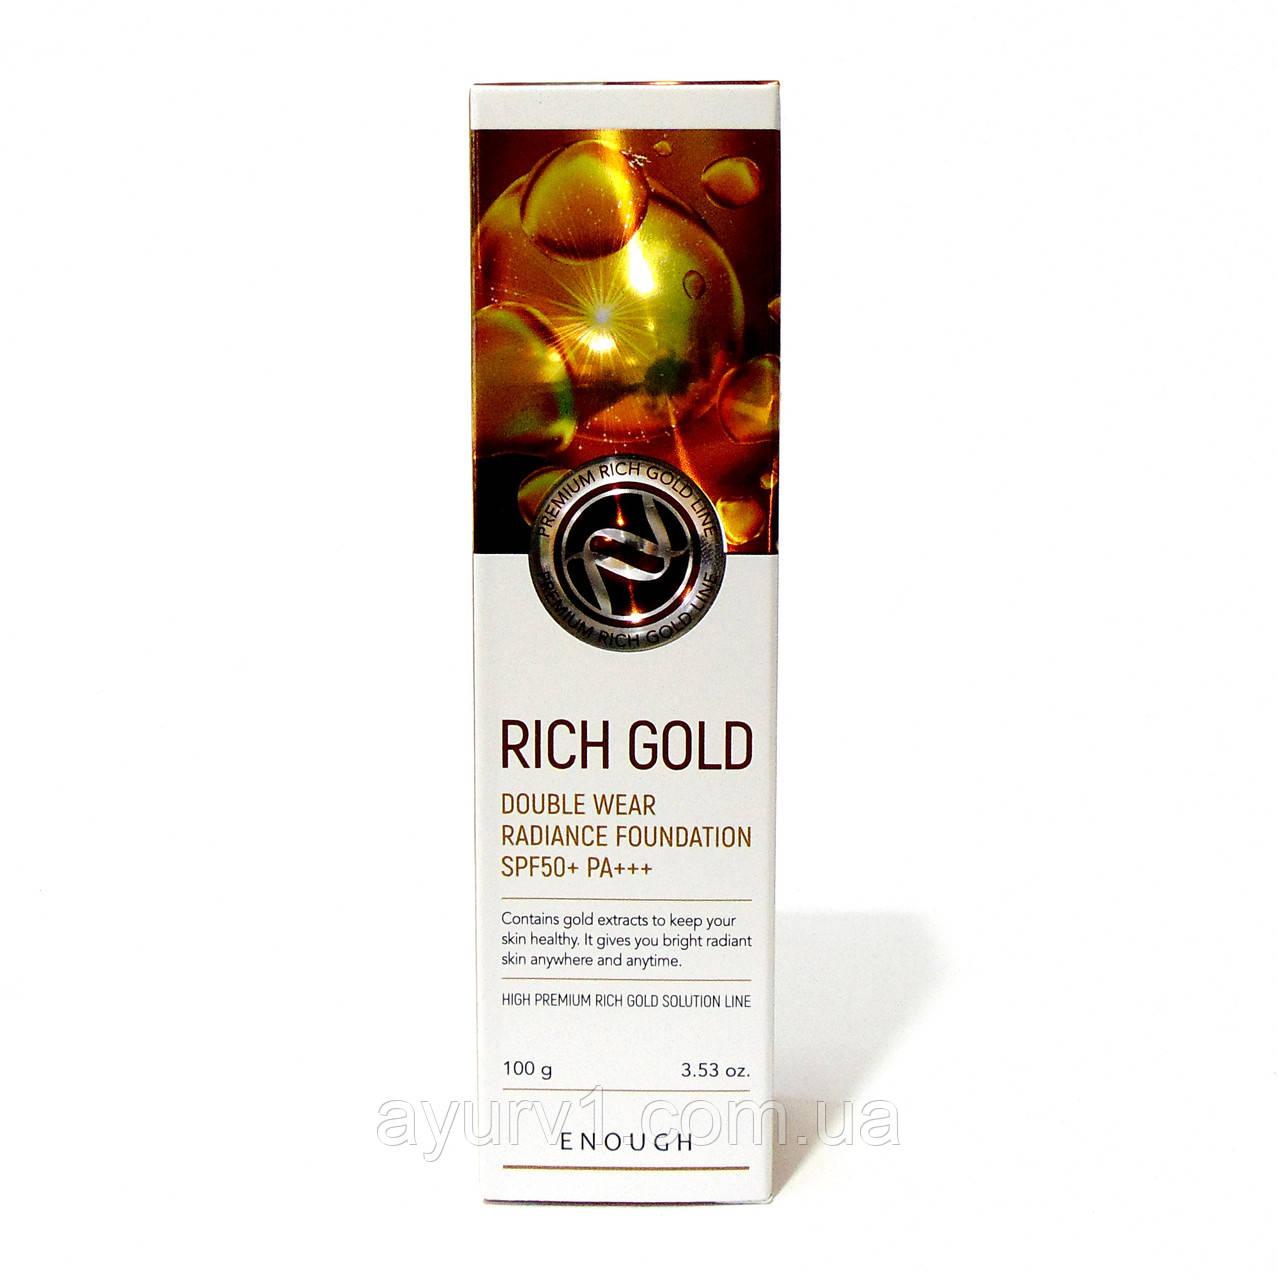 Тональная основа омолаживающая Enough Rich Gold Double Wear Radiance Foundation SPF50+ PA+++ 100 г